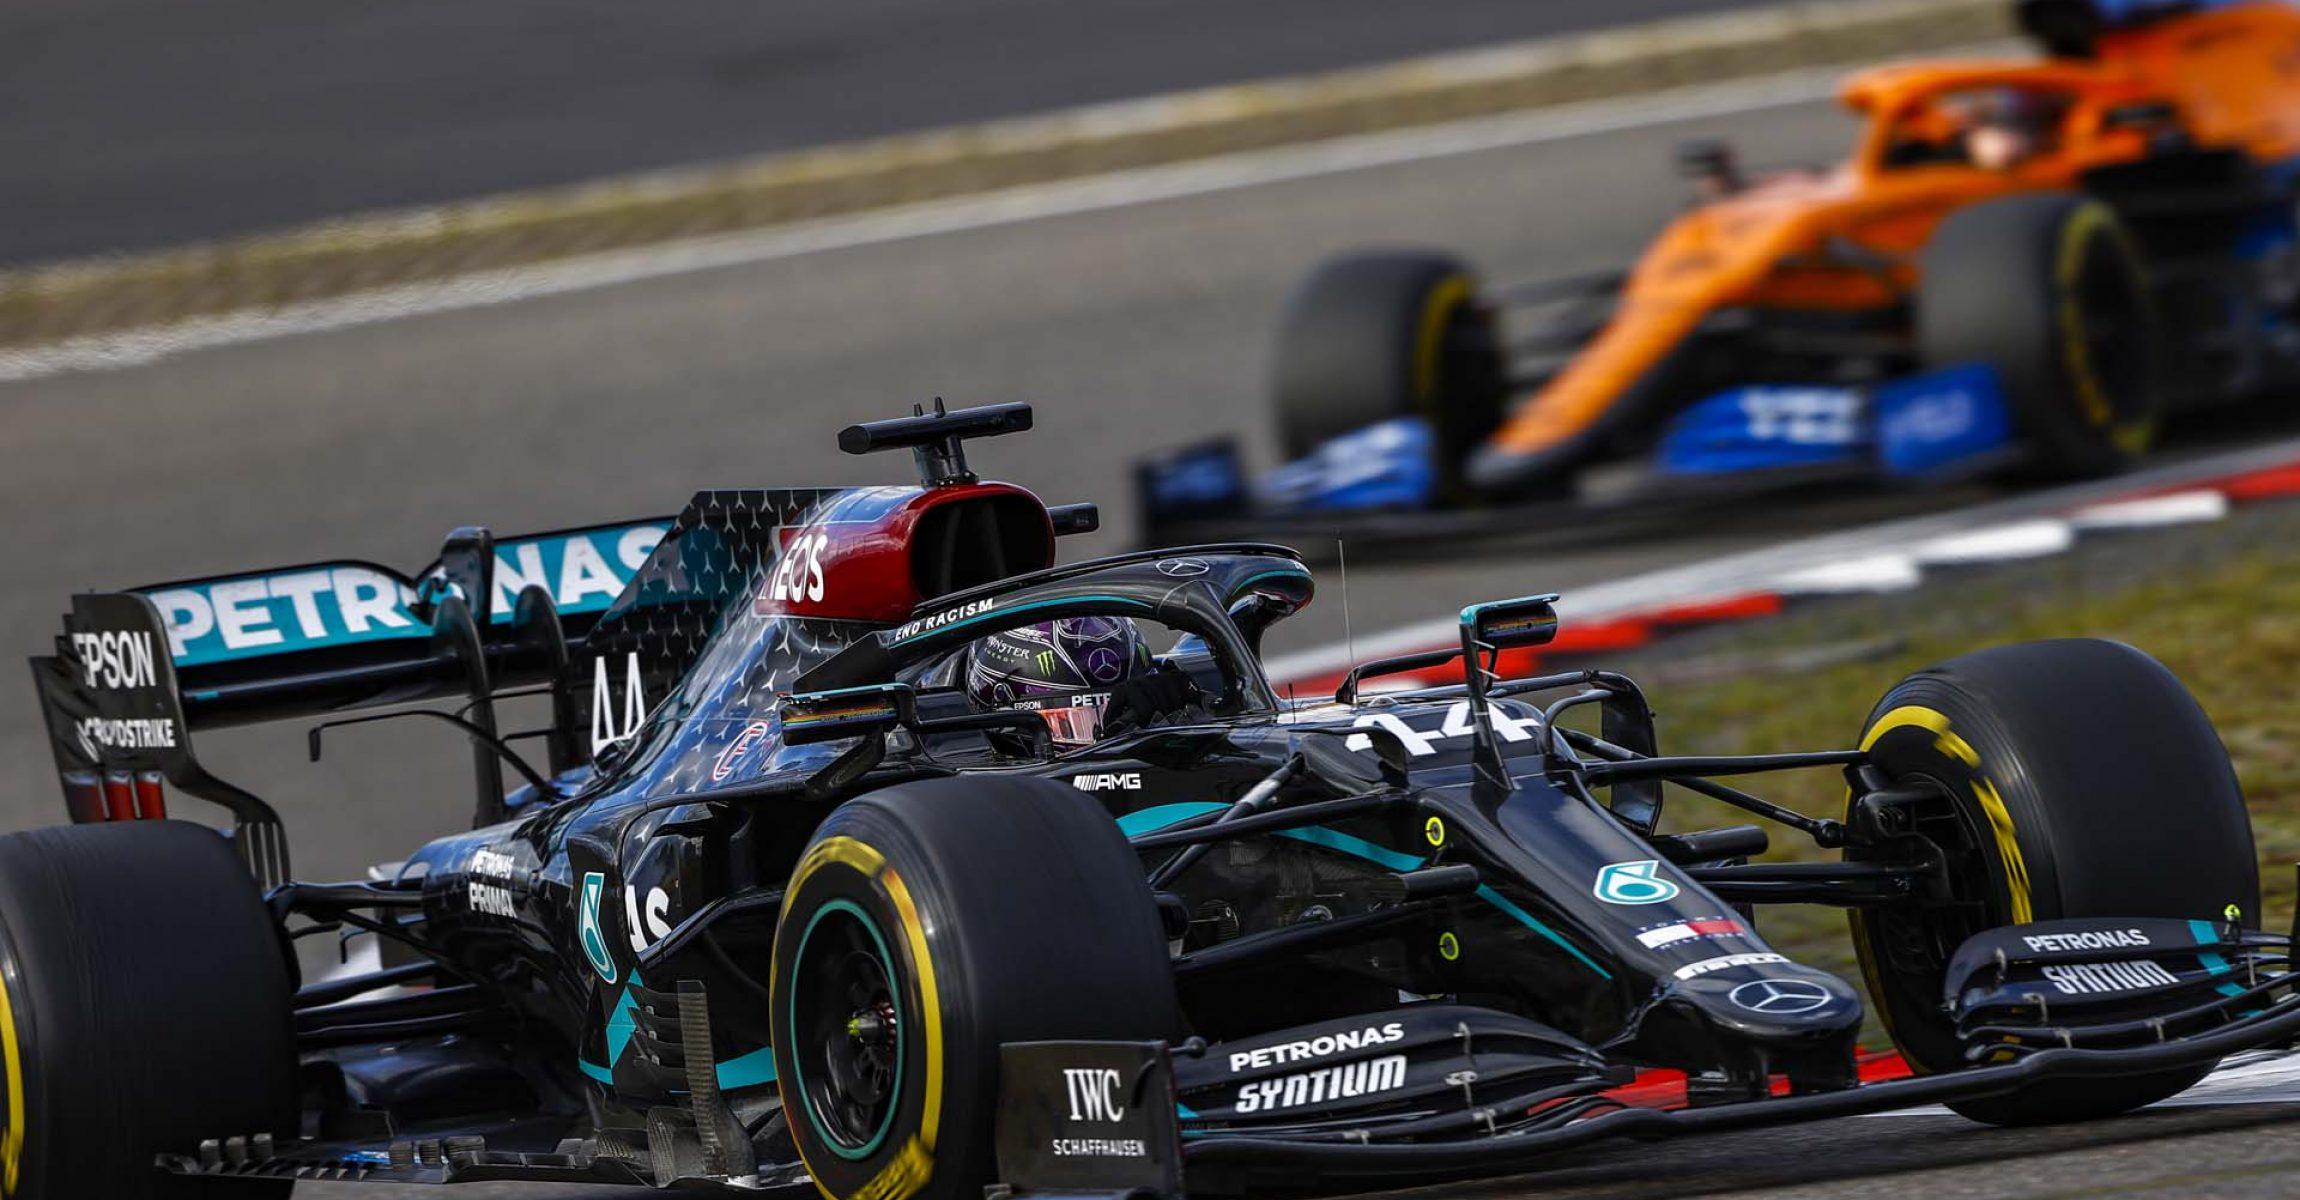 2020 Eifel Grand Prix, Sunday - LAT Images Lewis Hamilton Mercedes